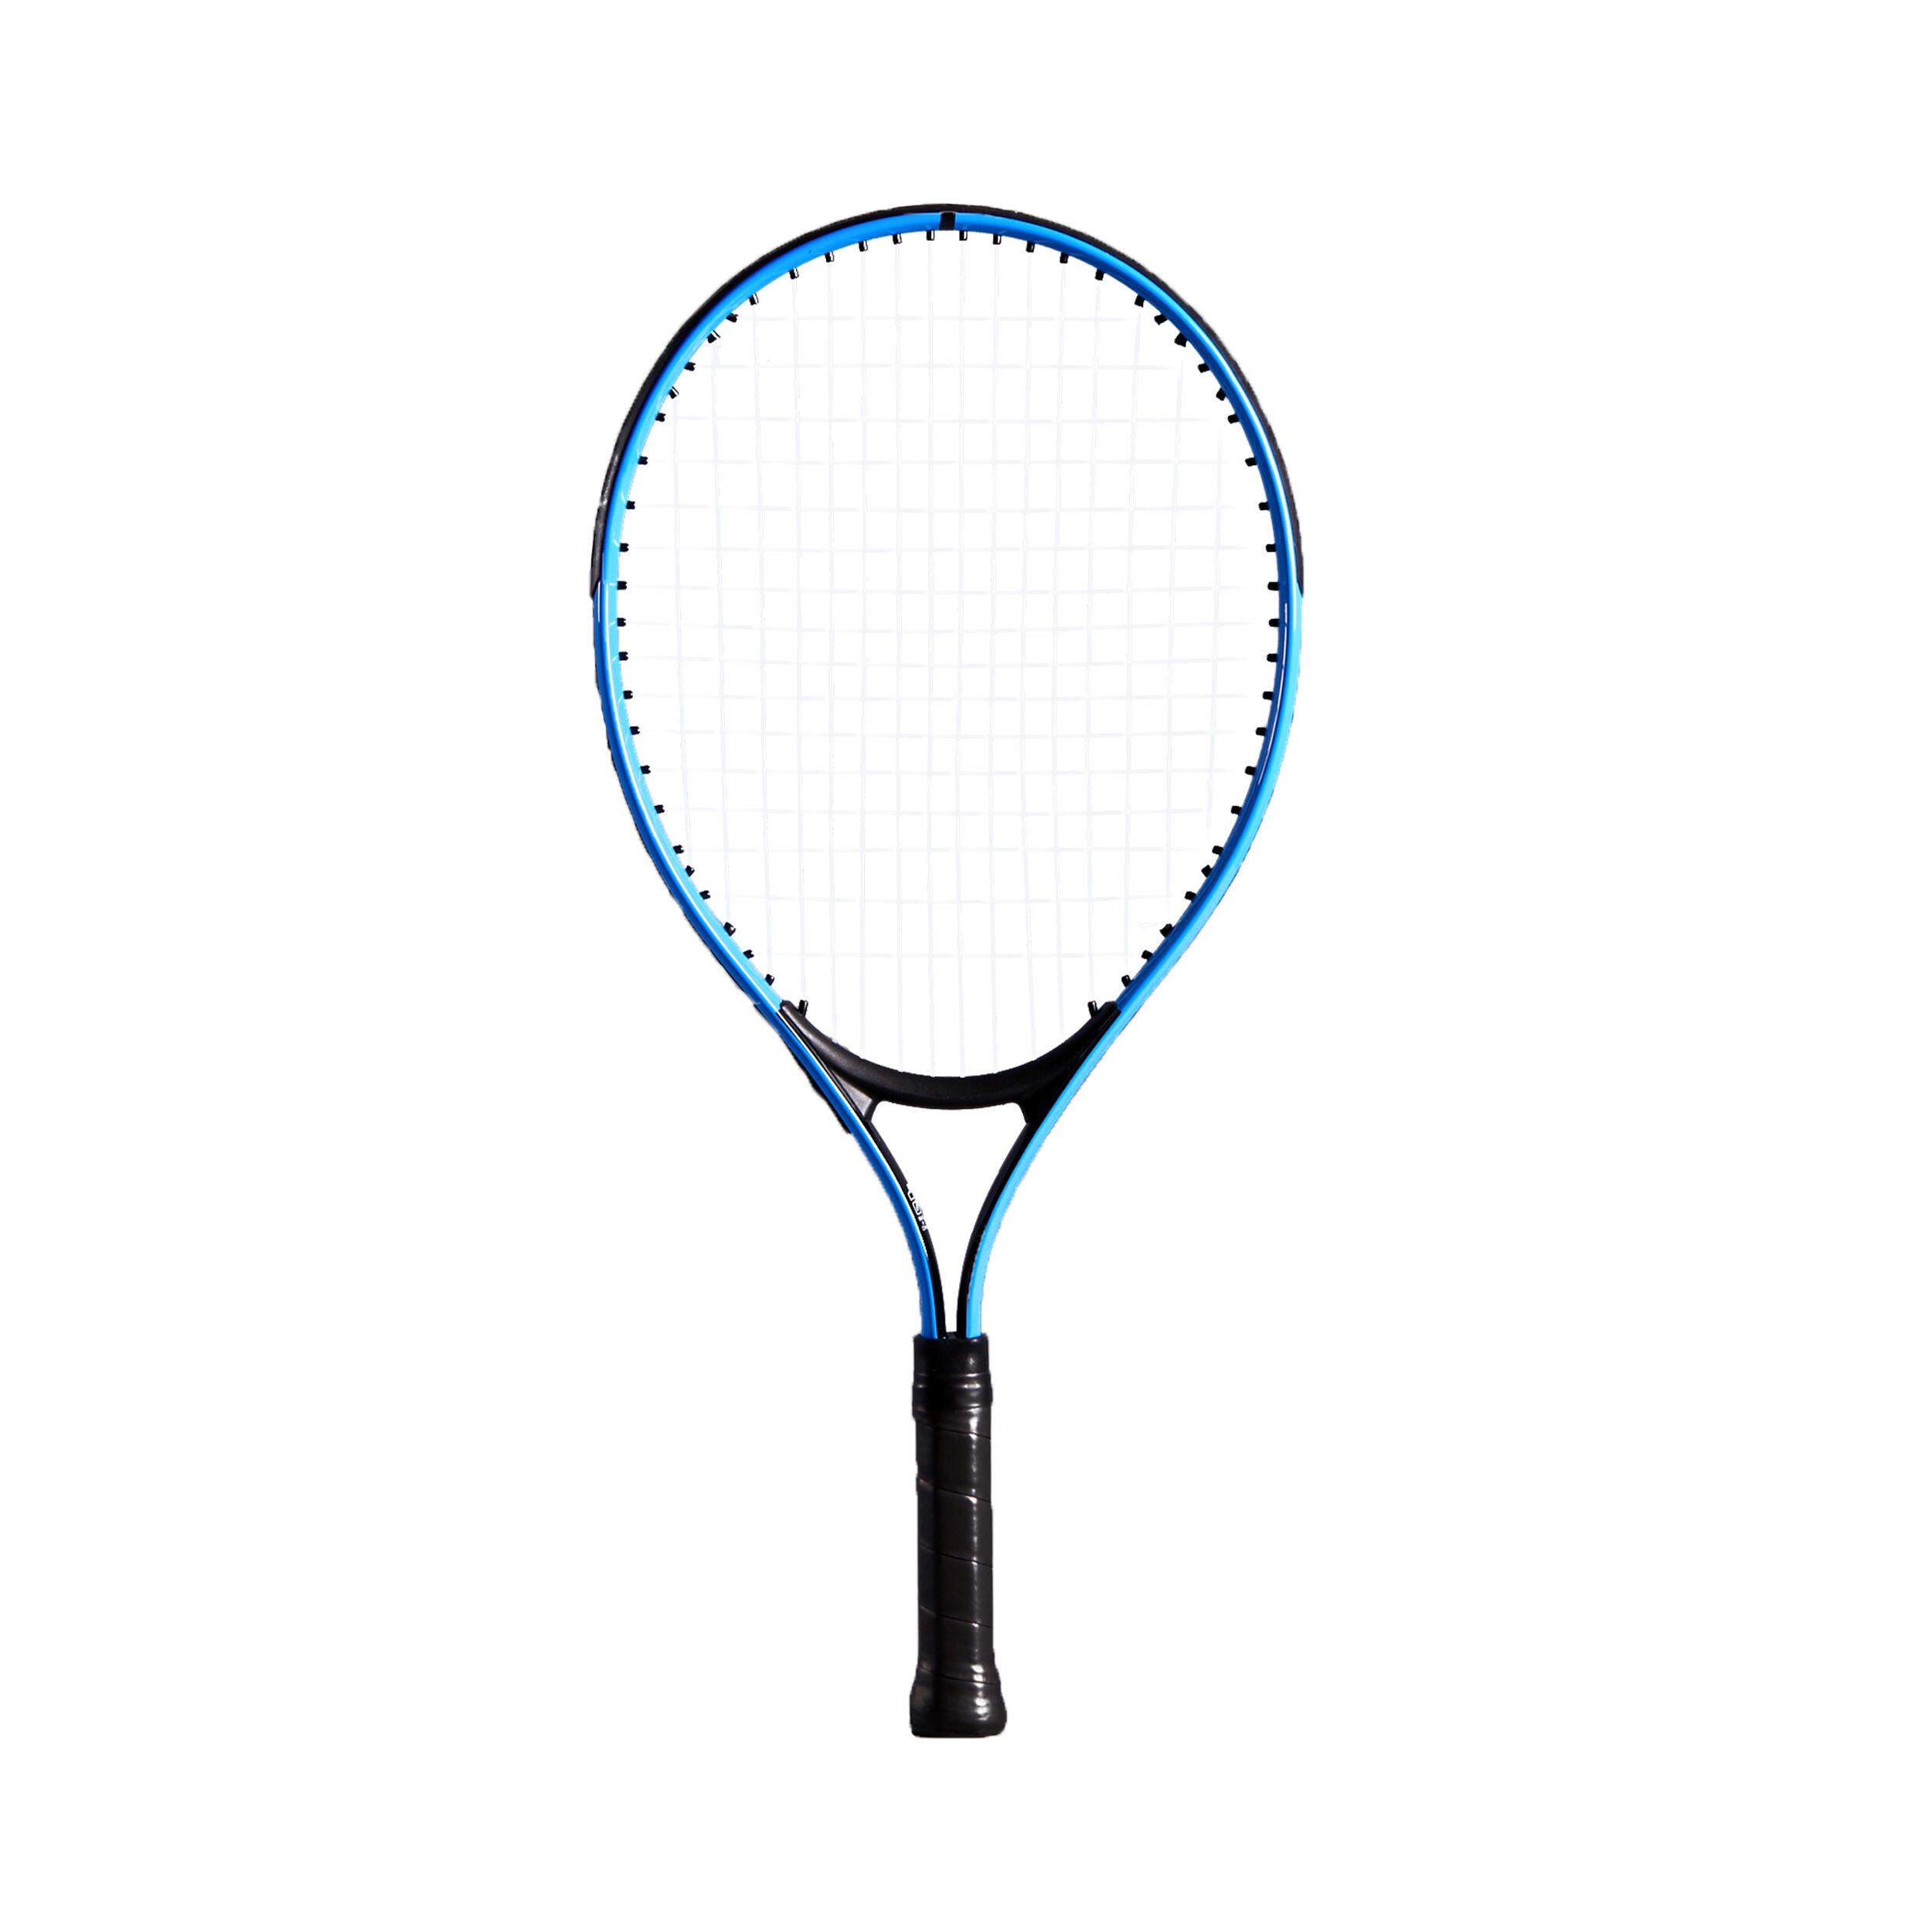 Rachetă Tenis TR100 M21 Copii imagine